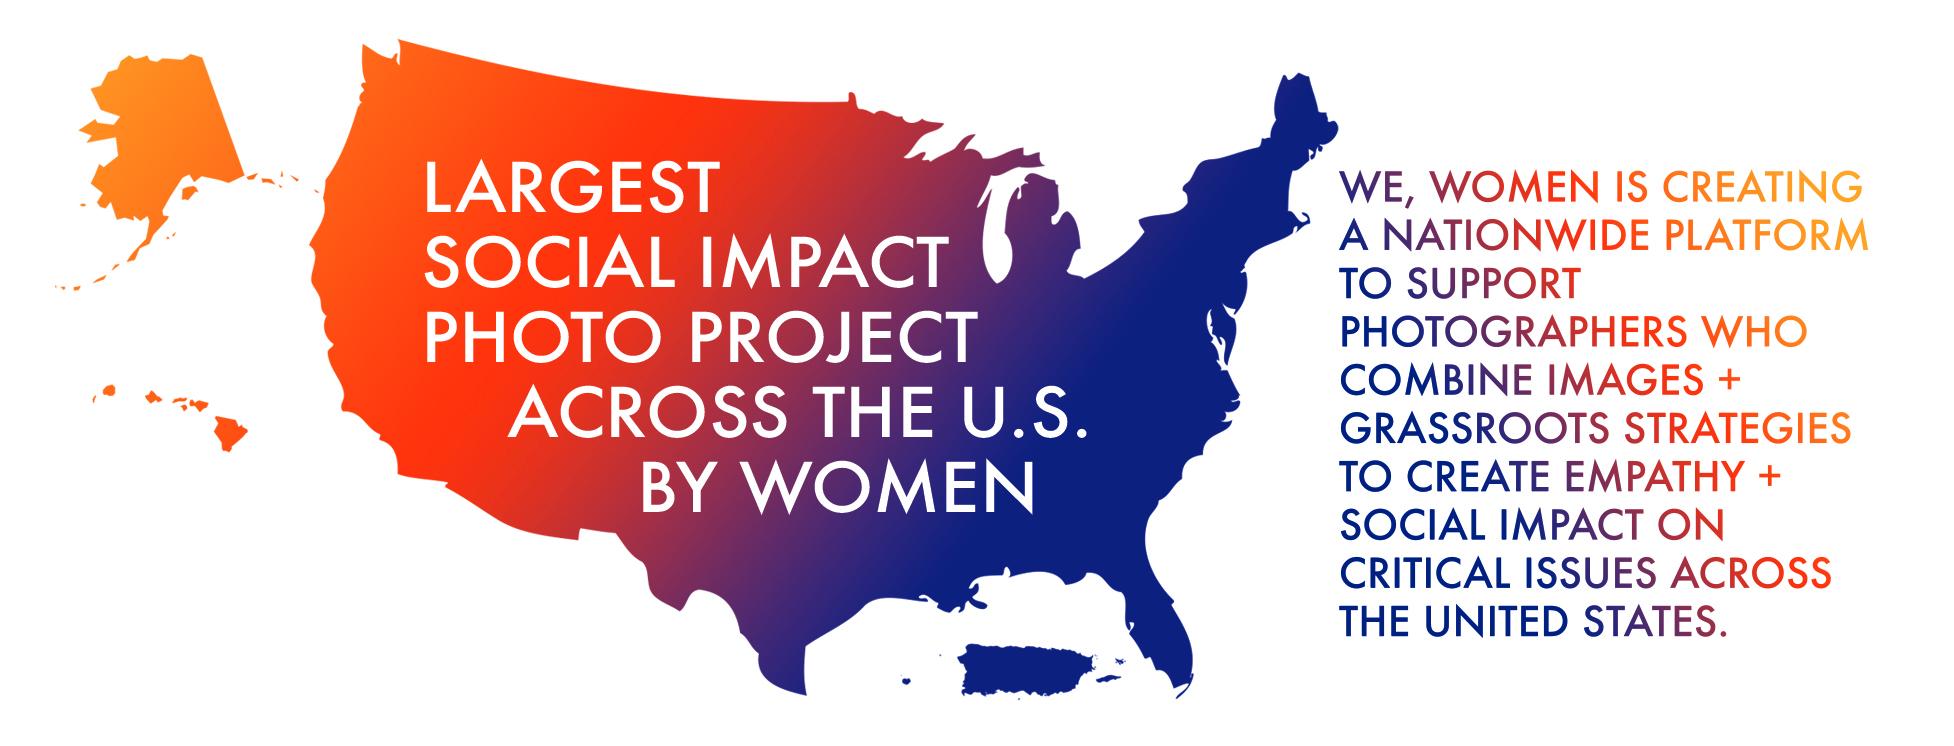 We, Women Map.jpg